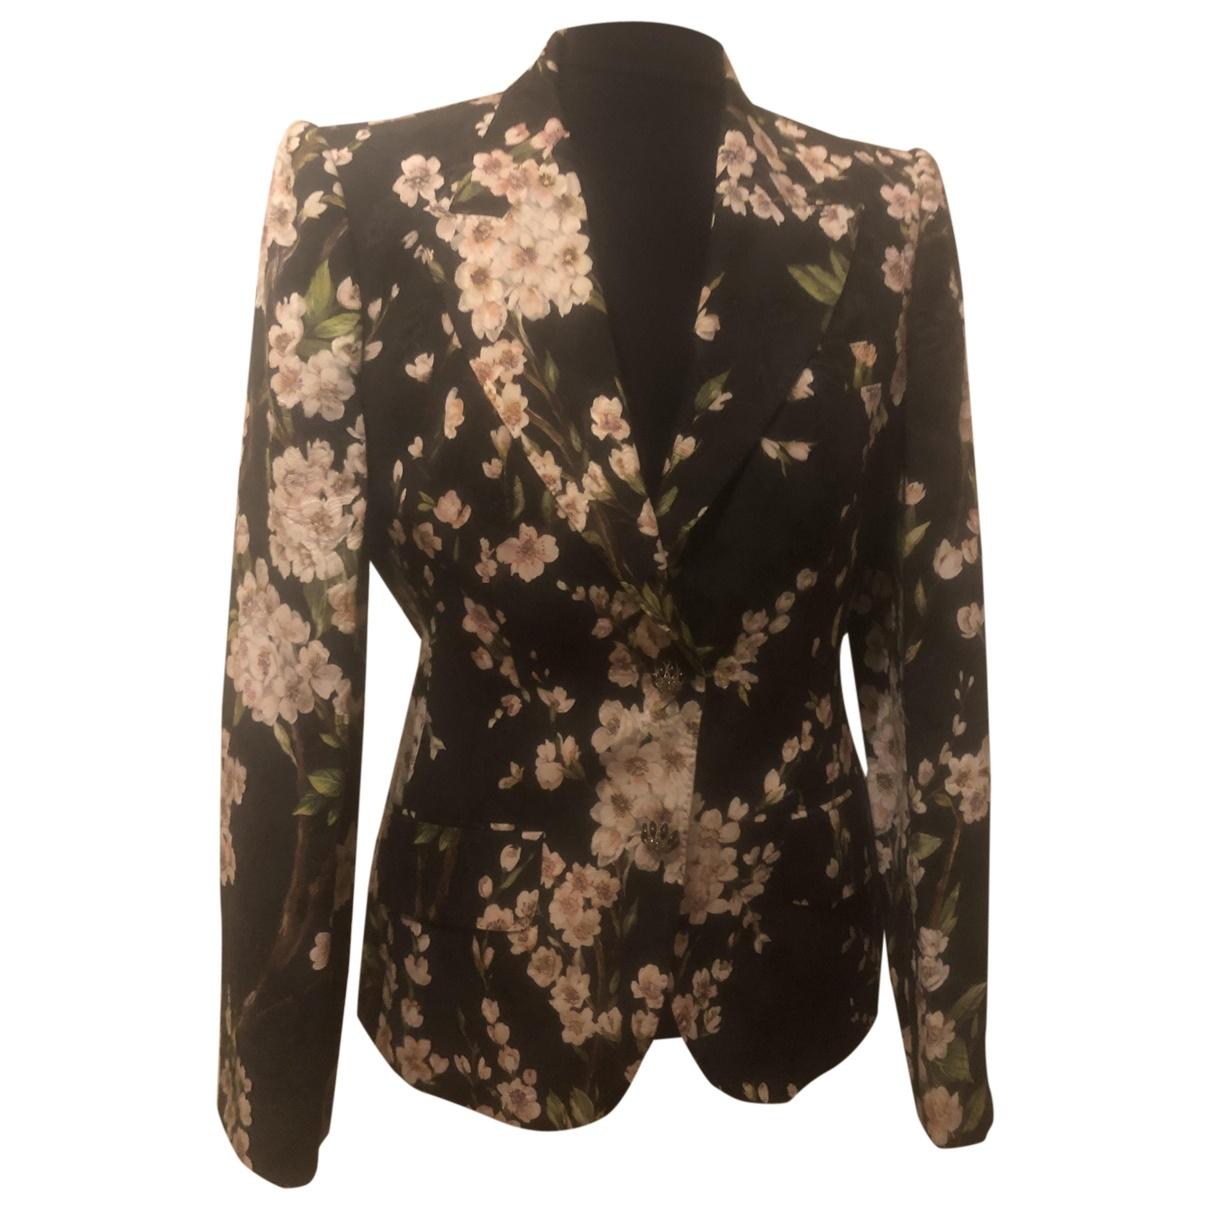 Dolce & Gabbana \N Multicolour Cotton jacket for Women 44 IT